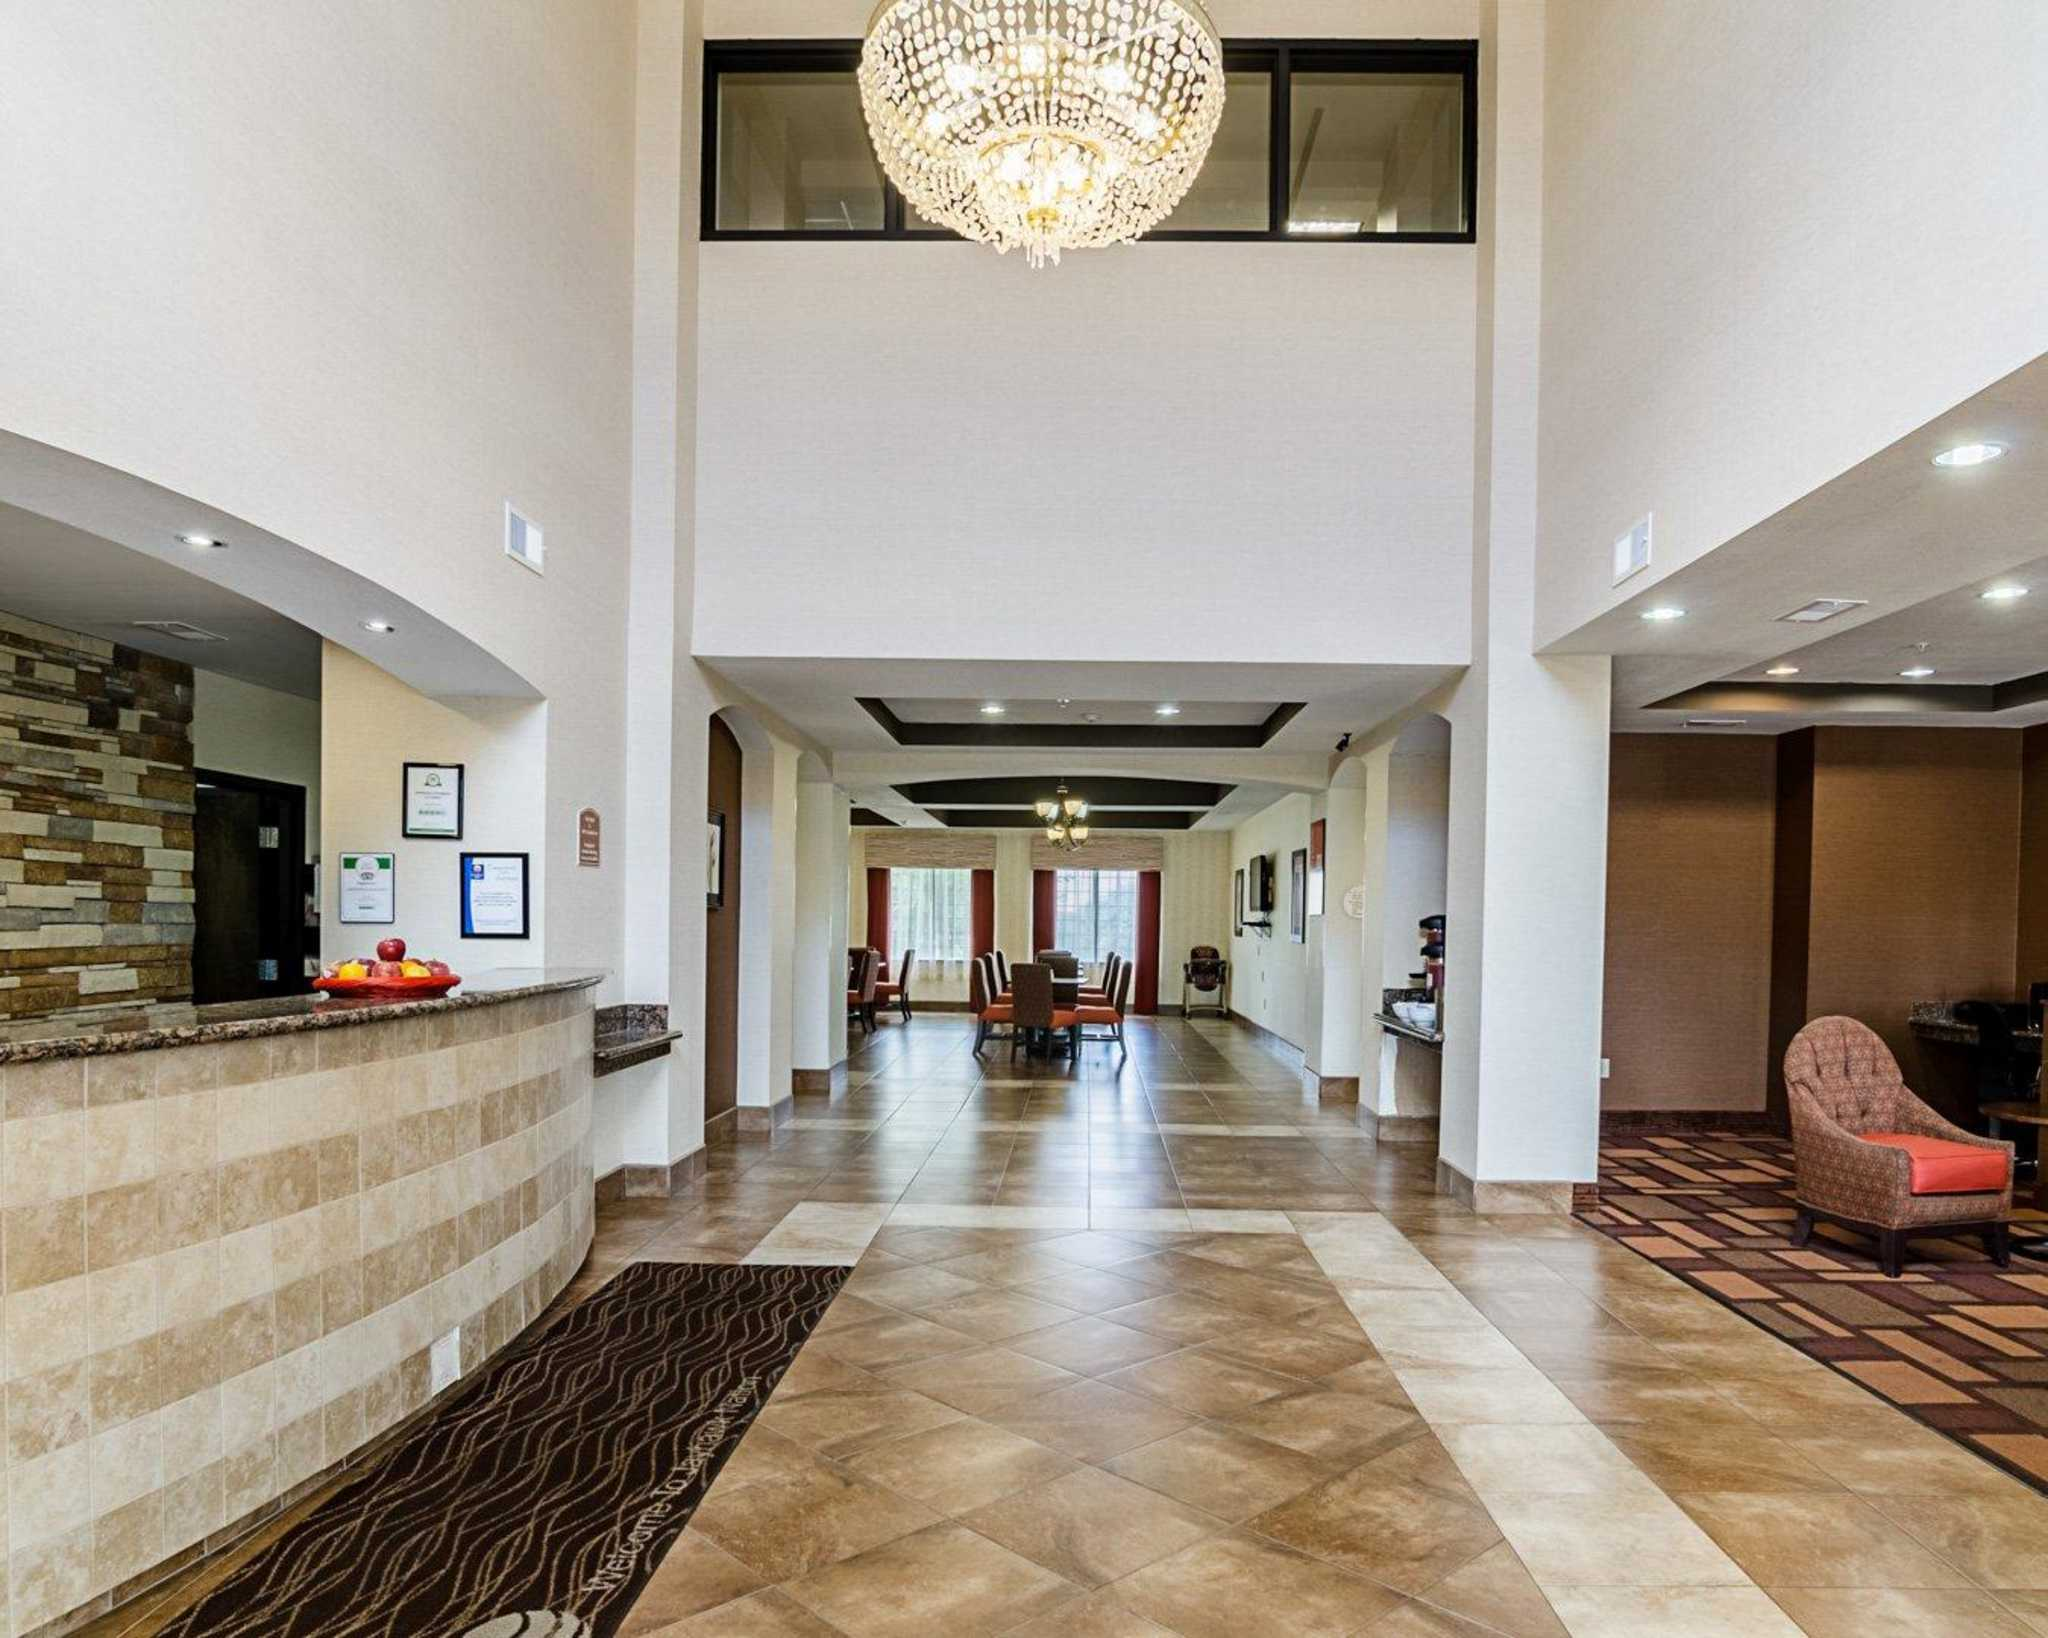 Comfort Inn & Suites Lawrence - University Area image 14